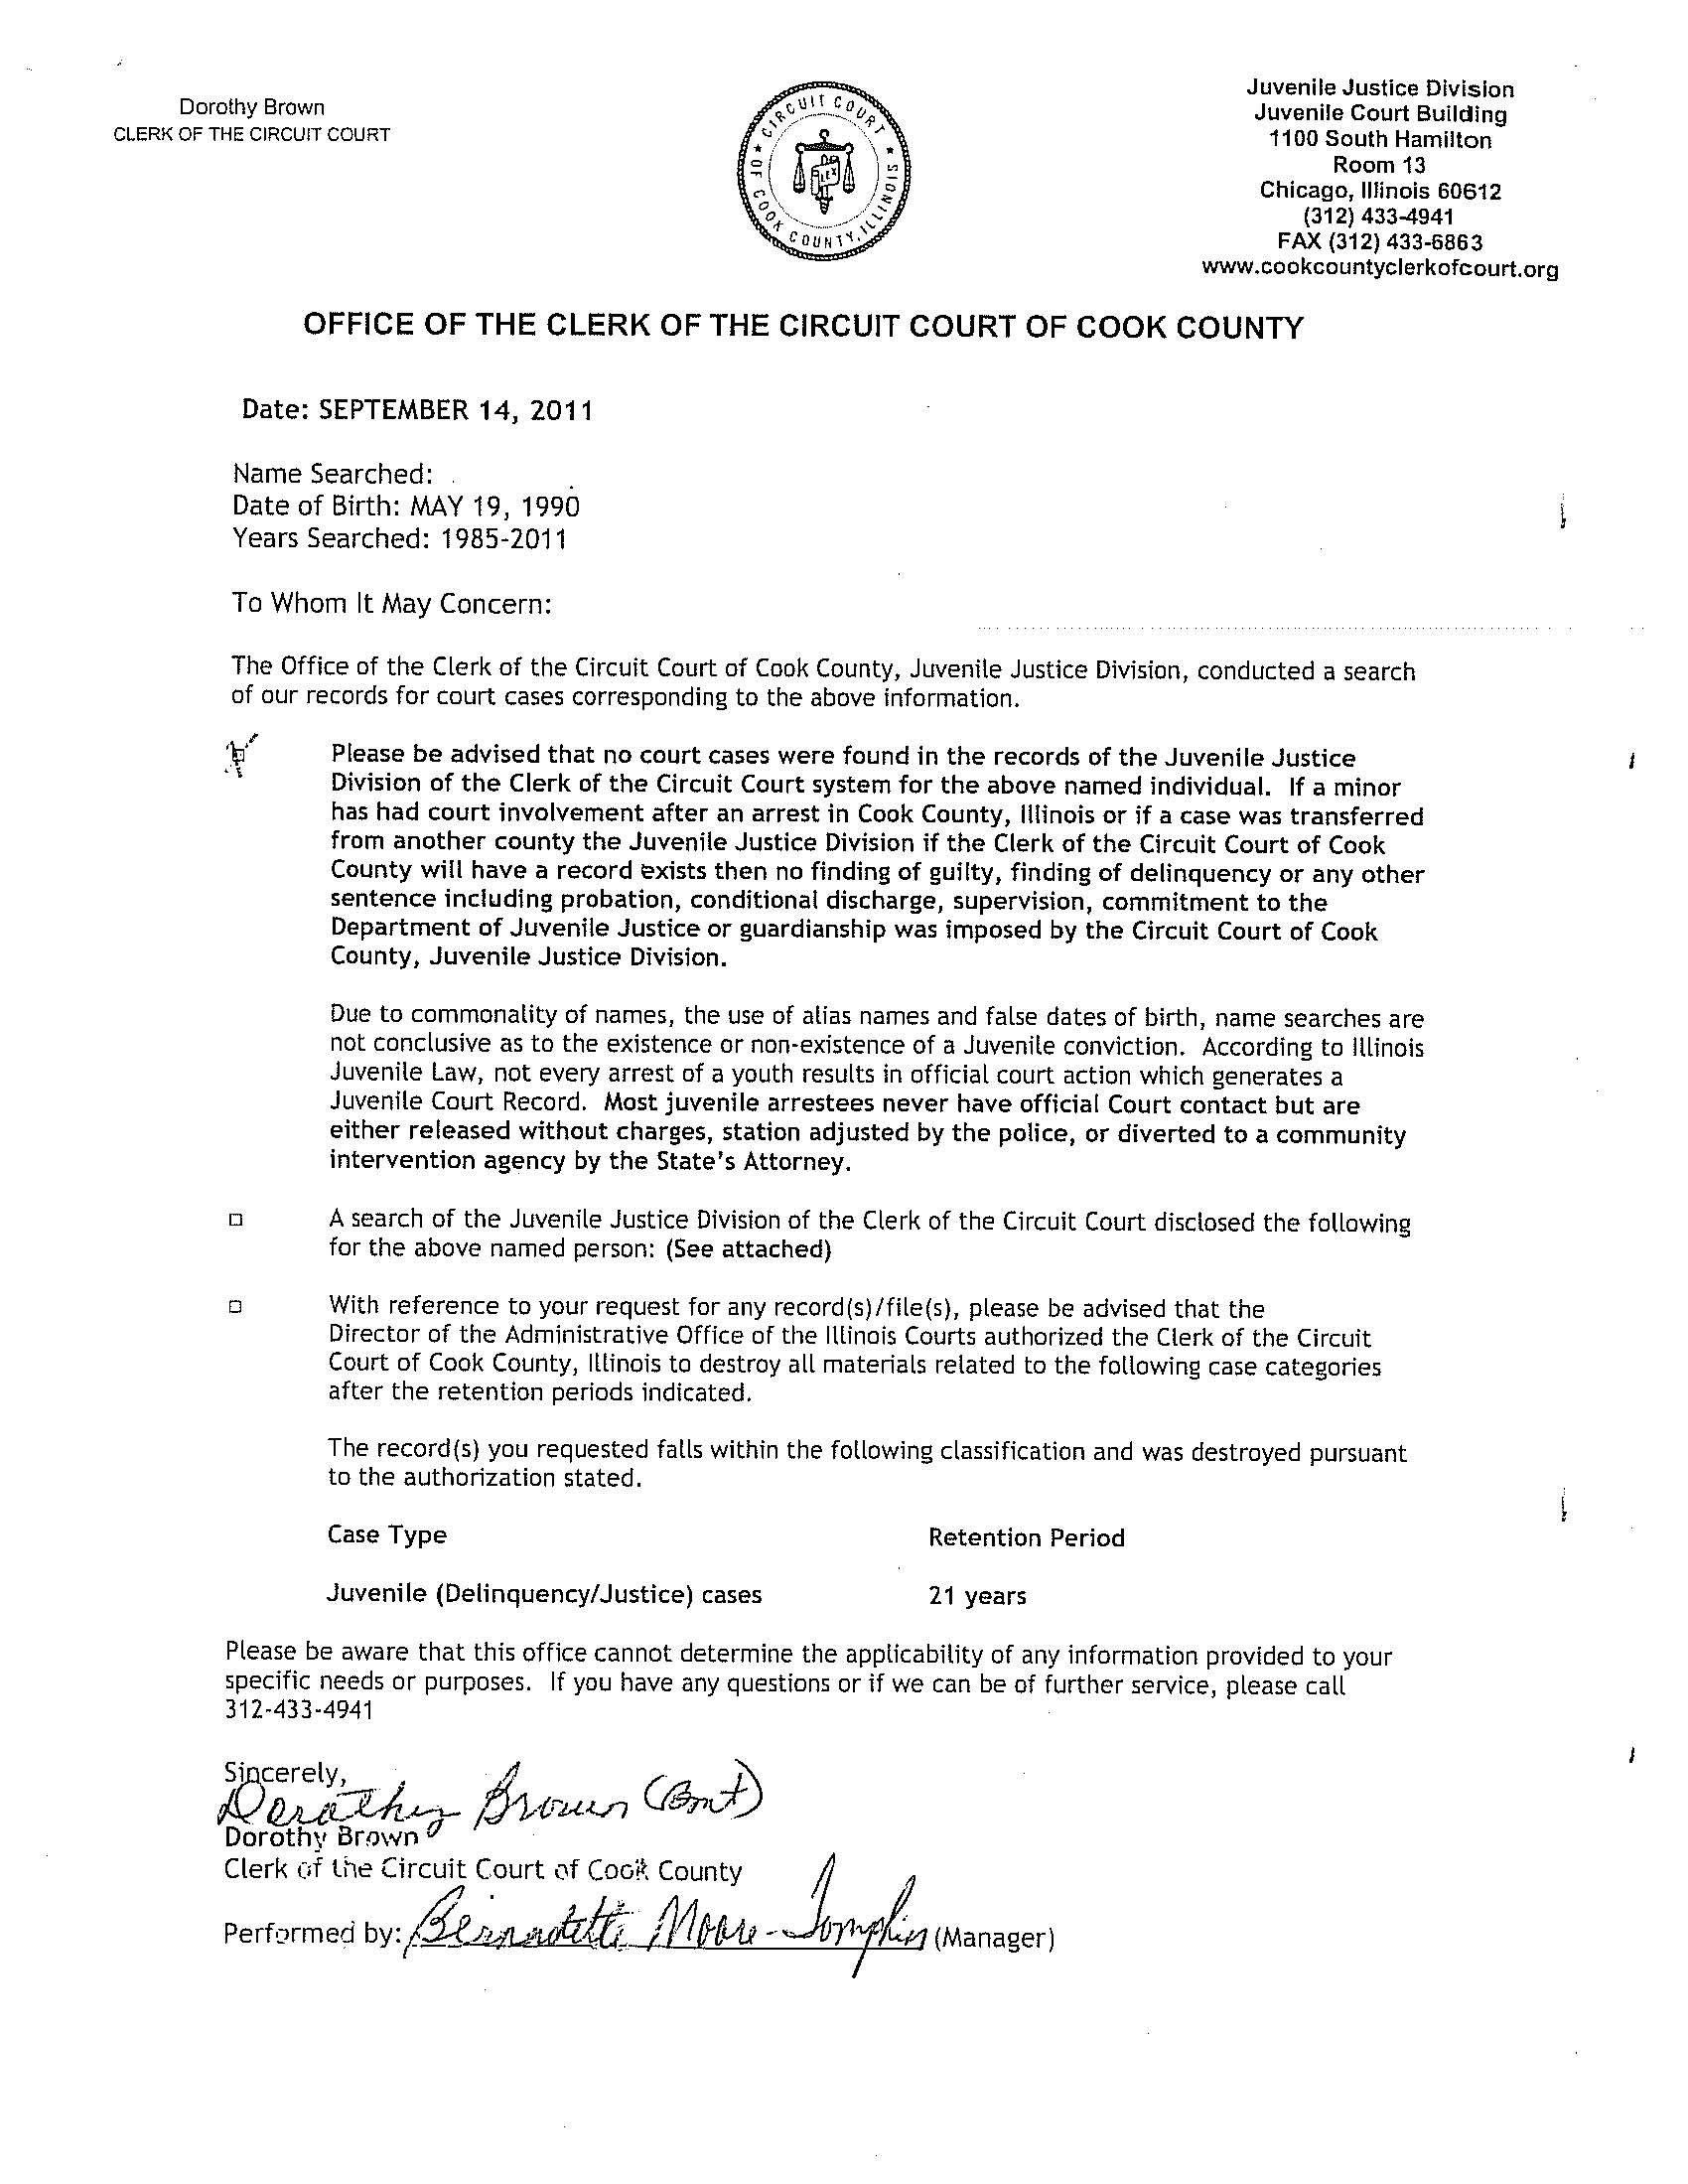 Best Photos Of Written Court Order Postal Order  Formal business